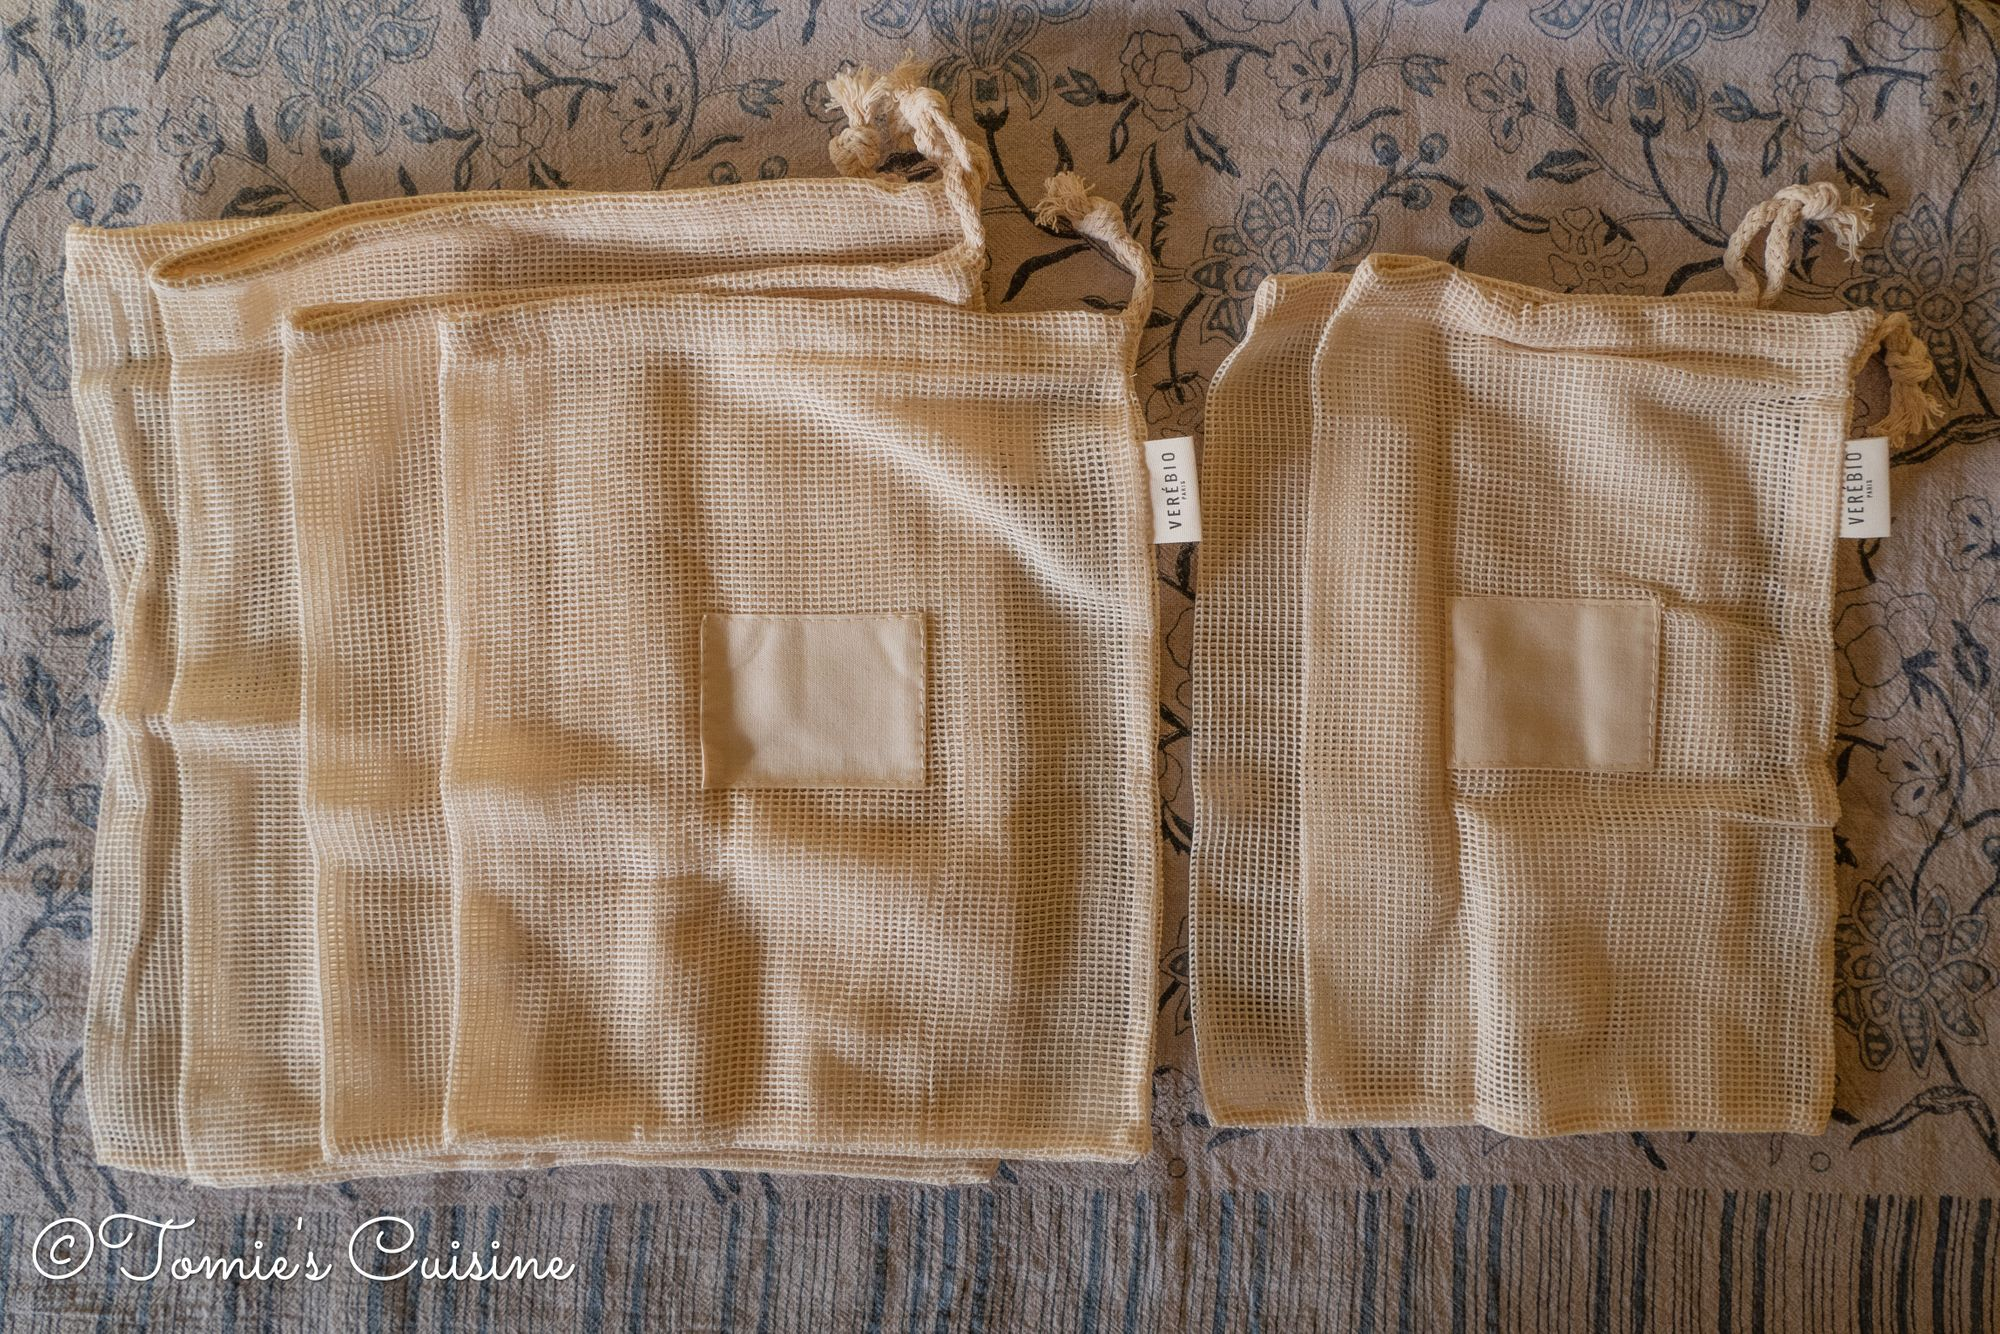 Verebio's mesh bags set